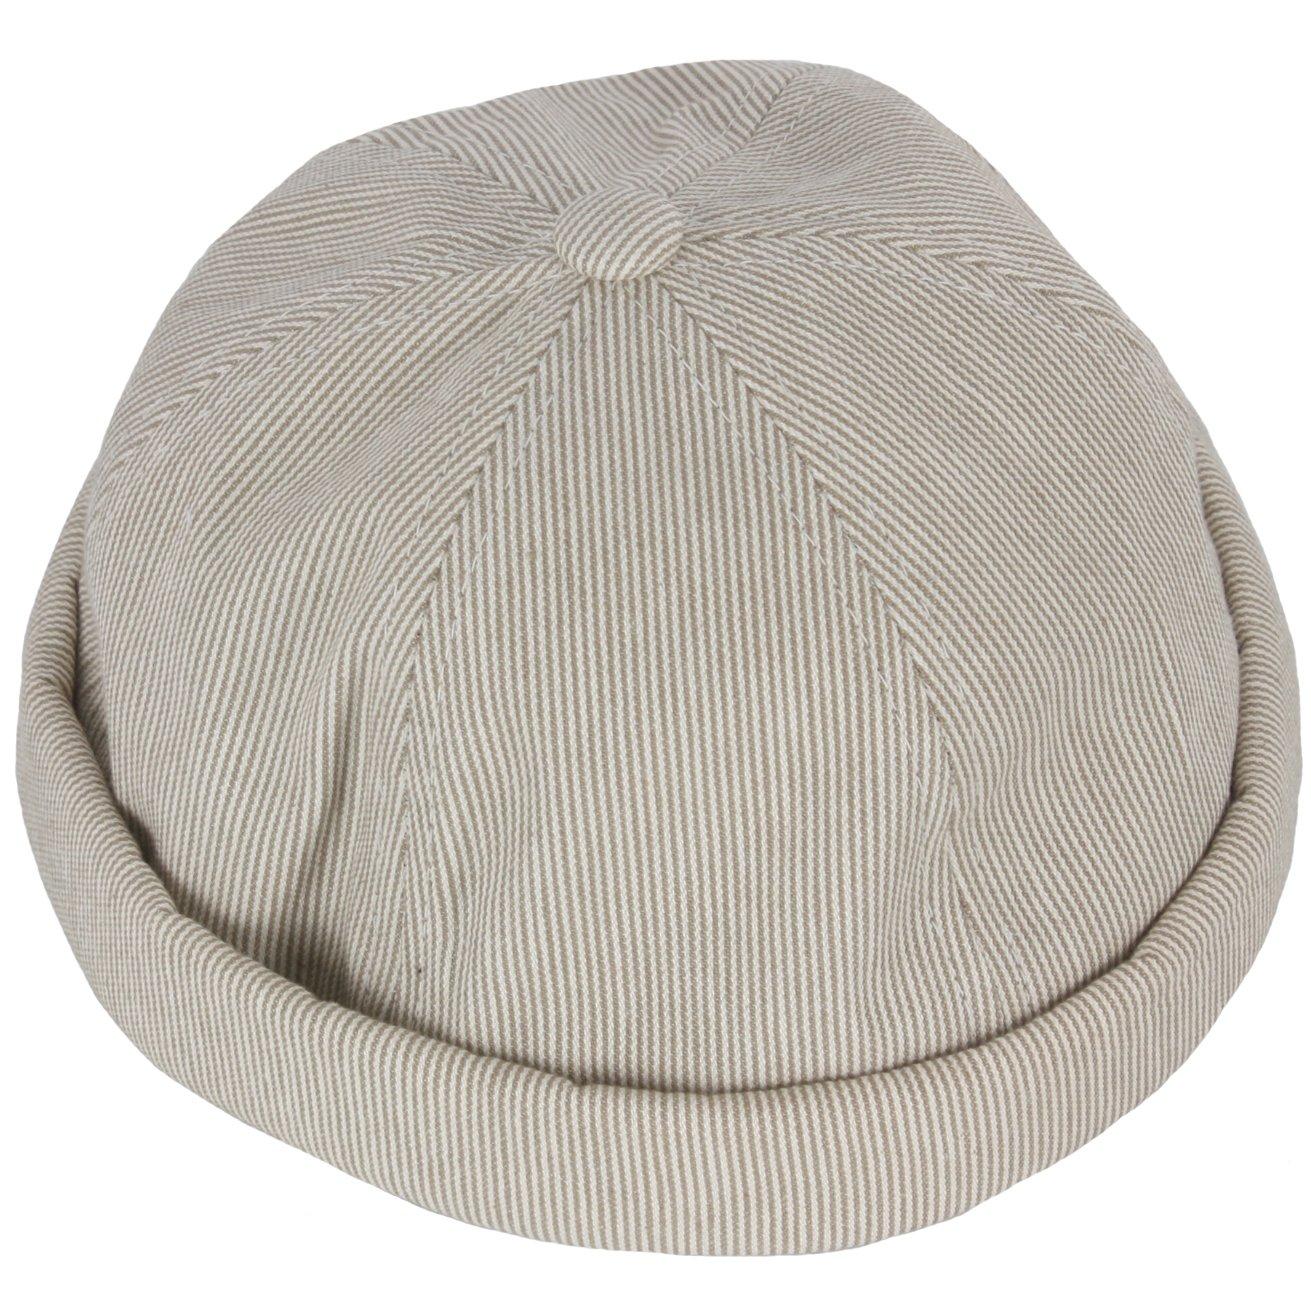 RaOn B177 Mens Womens Stripe No Bill Herringbone Style Ball Cap Baseball Hat Truckers